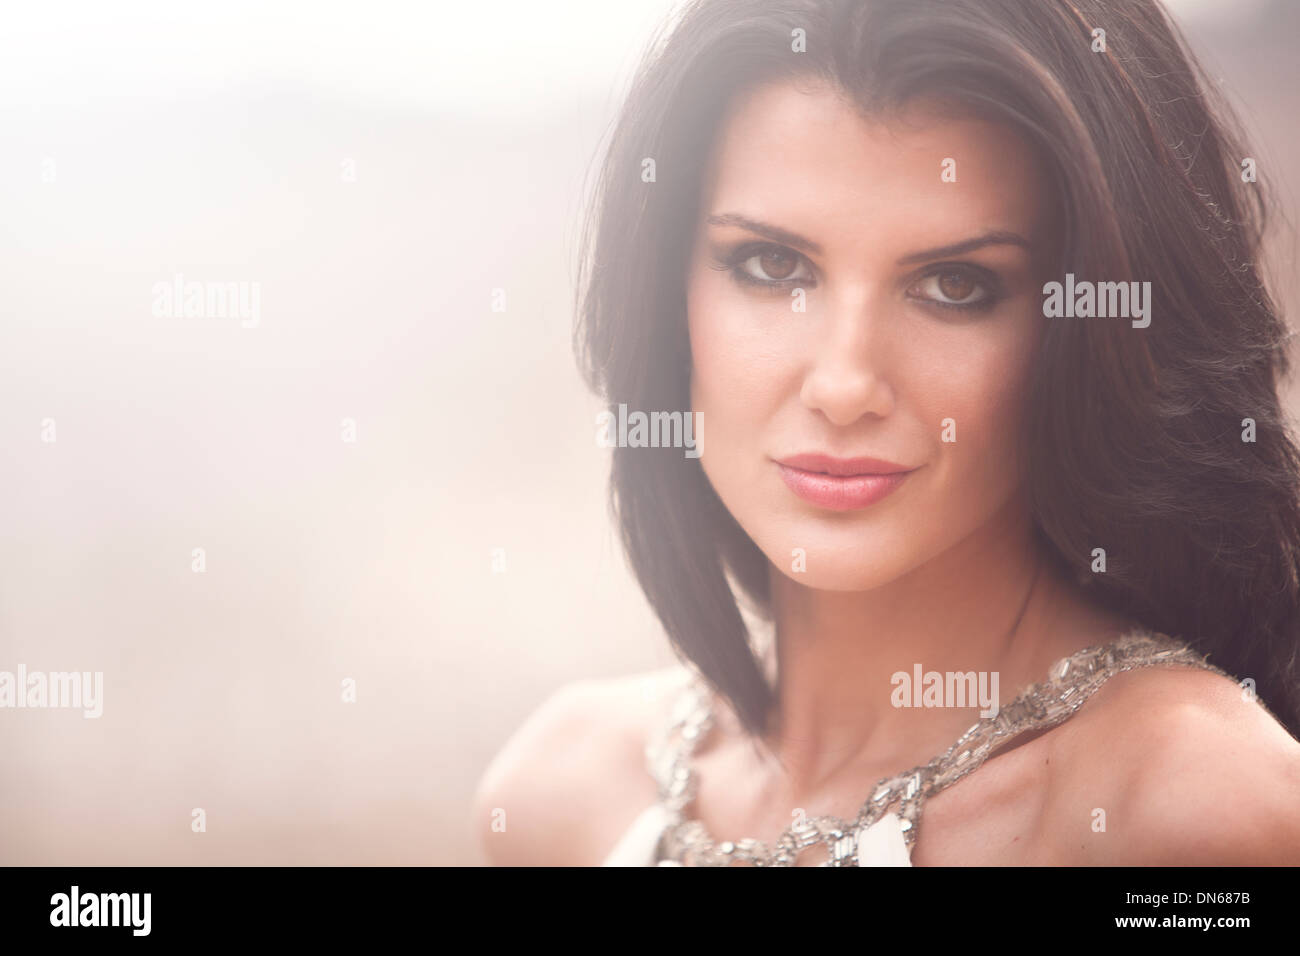 Schönheit Mode Portrait Frau draußen im Feld Stockbild